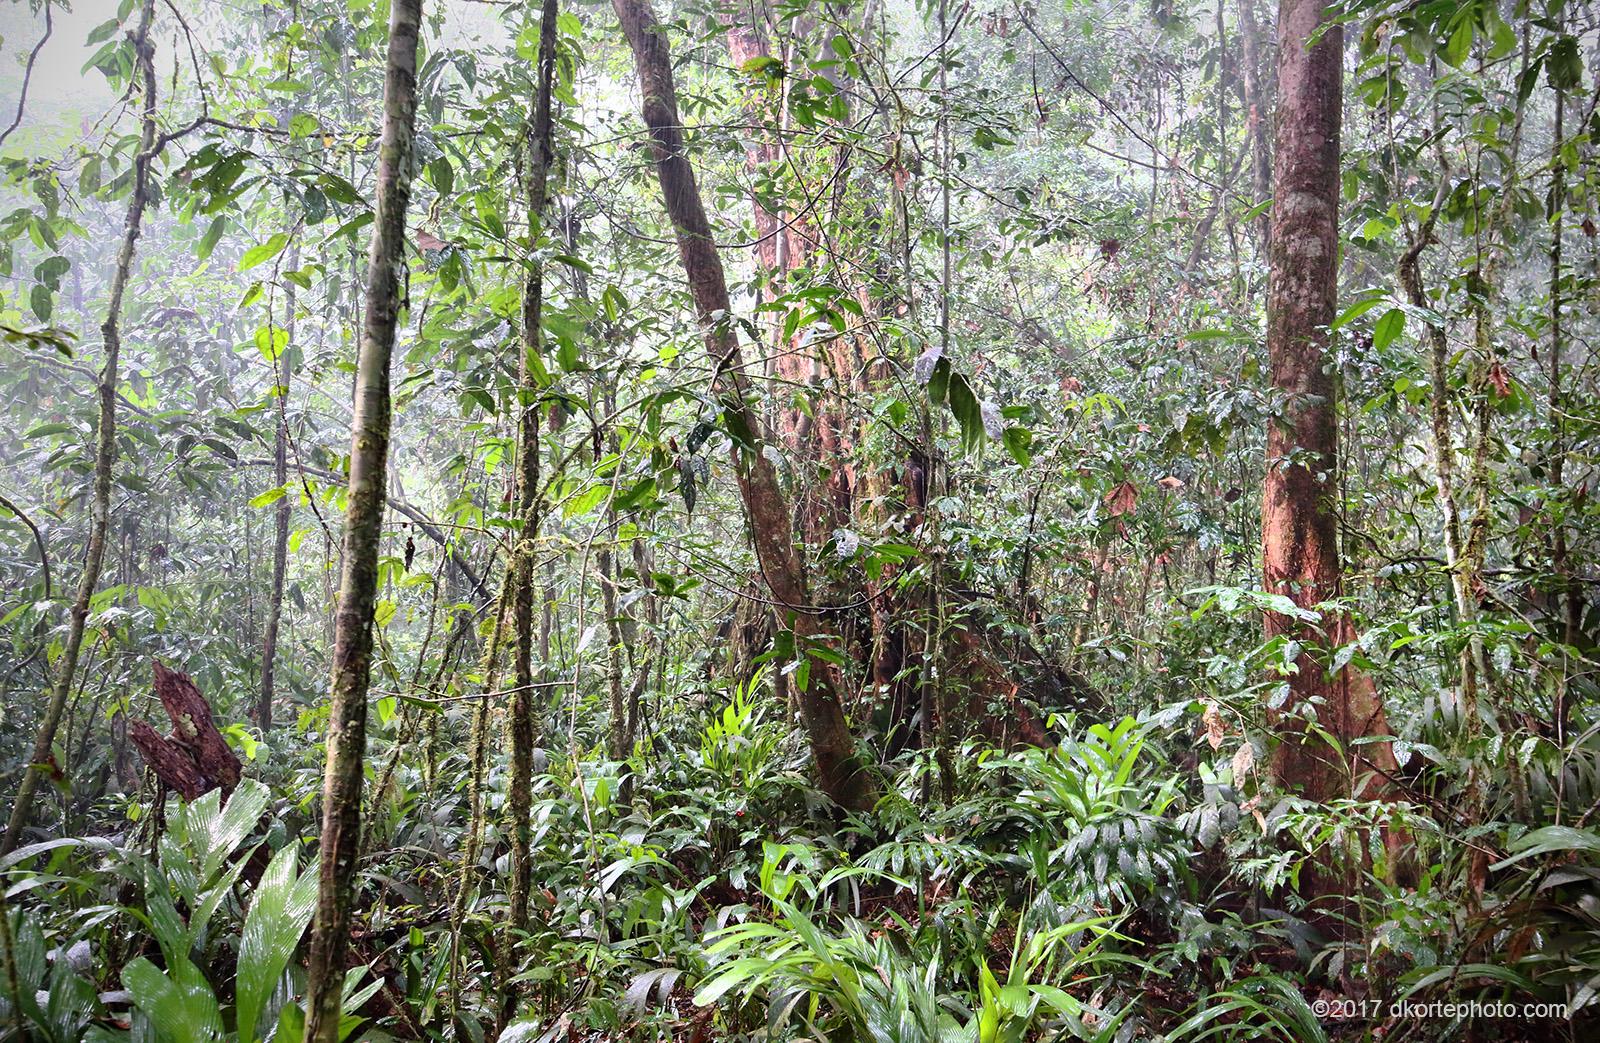 Liberia's Natural Resources